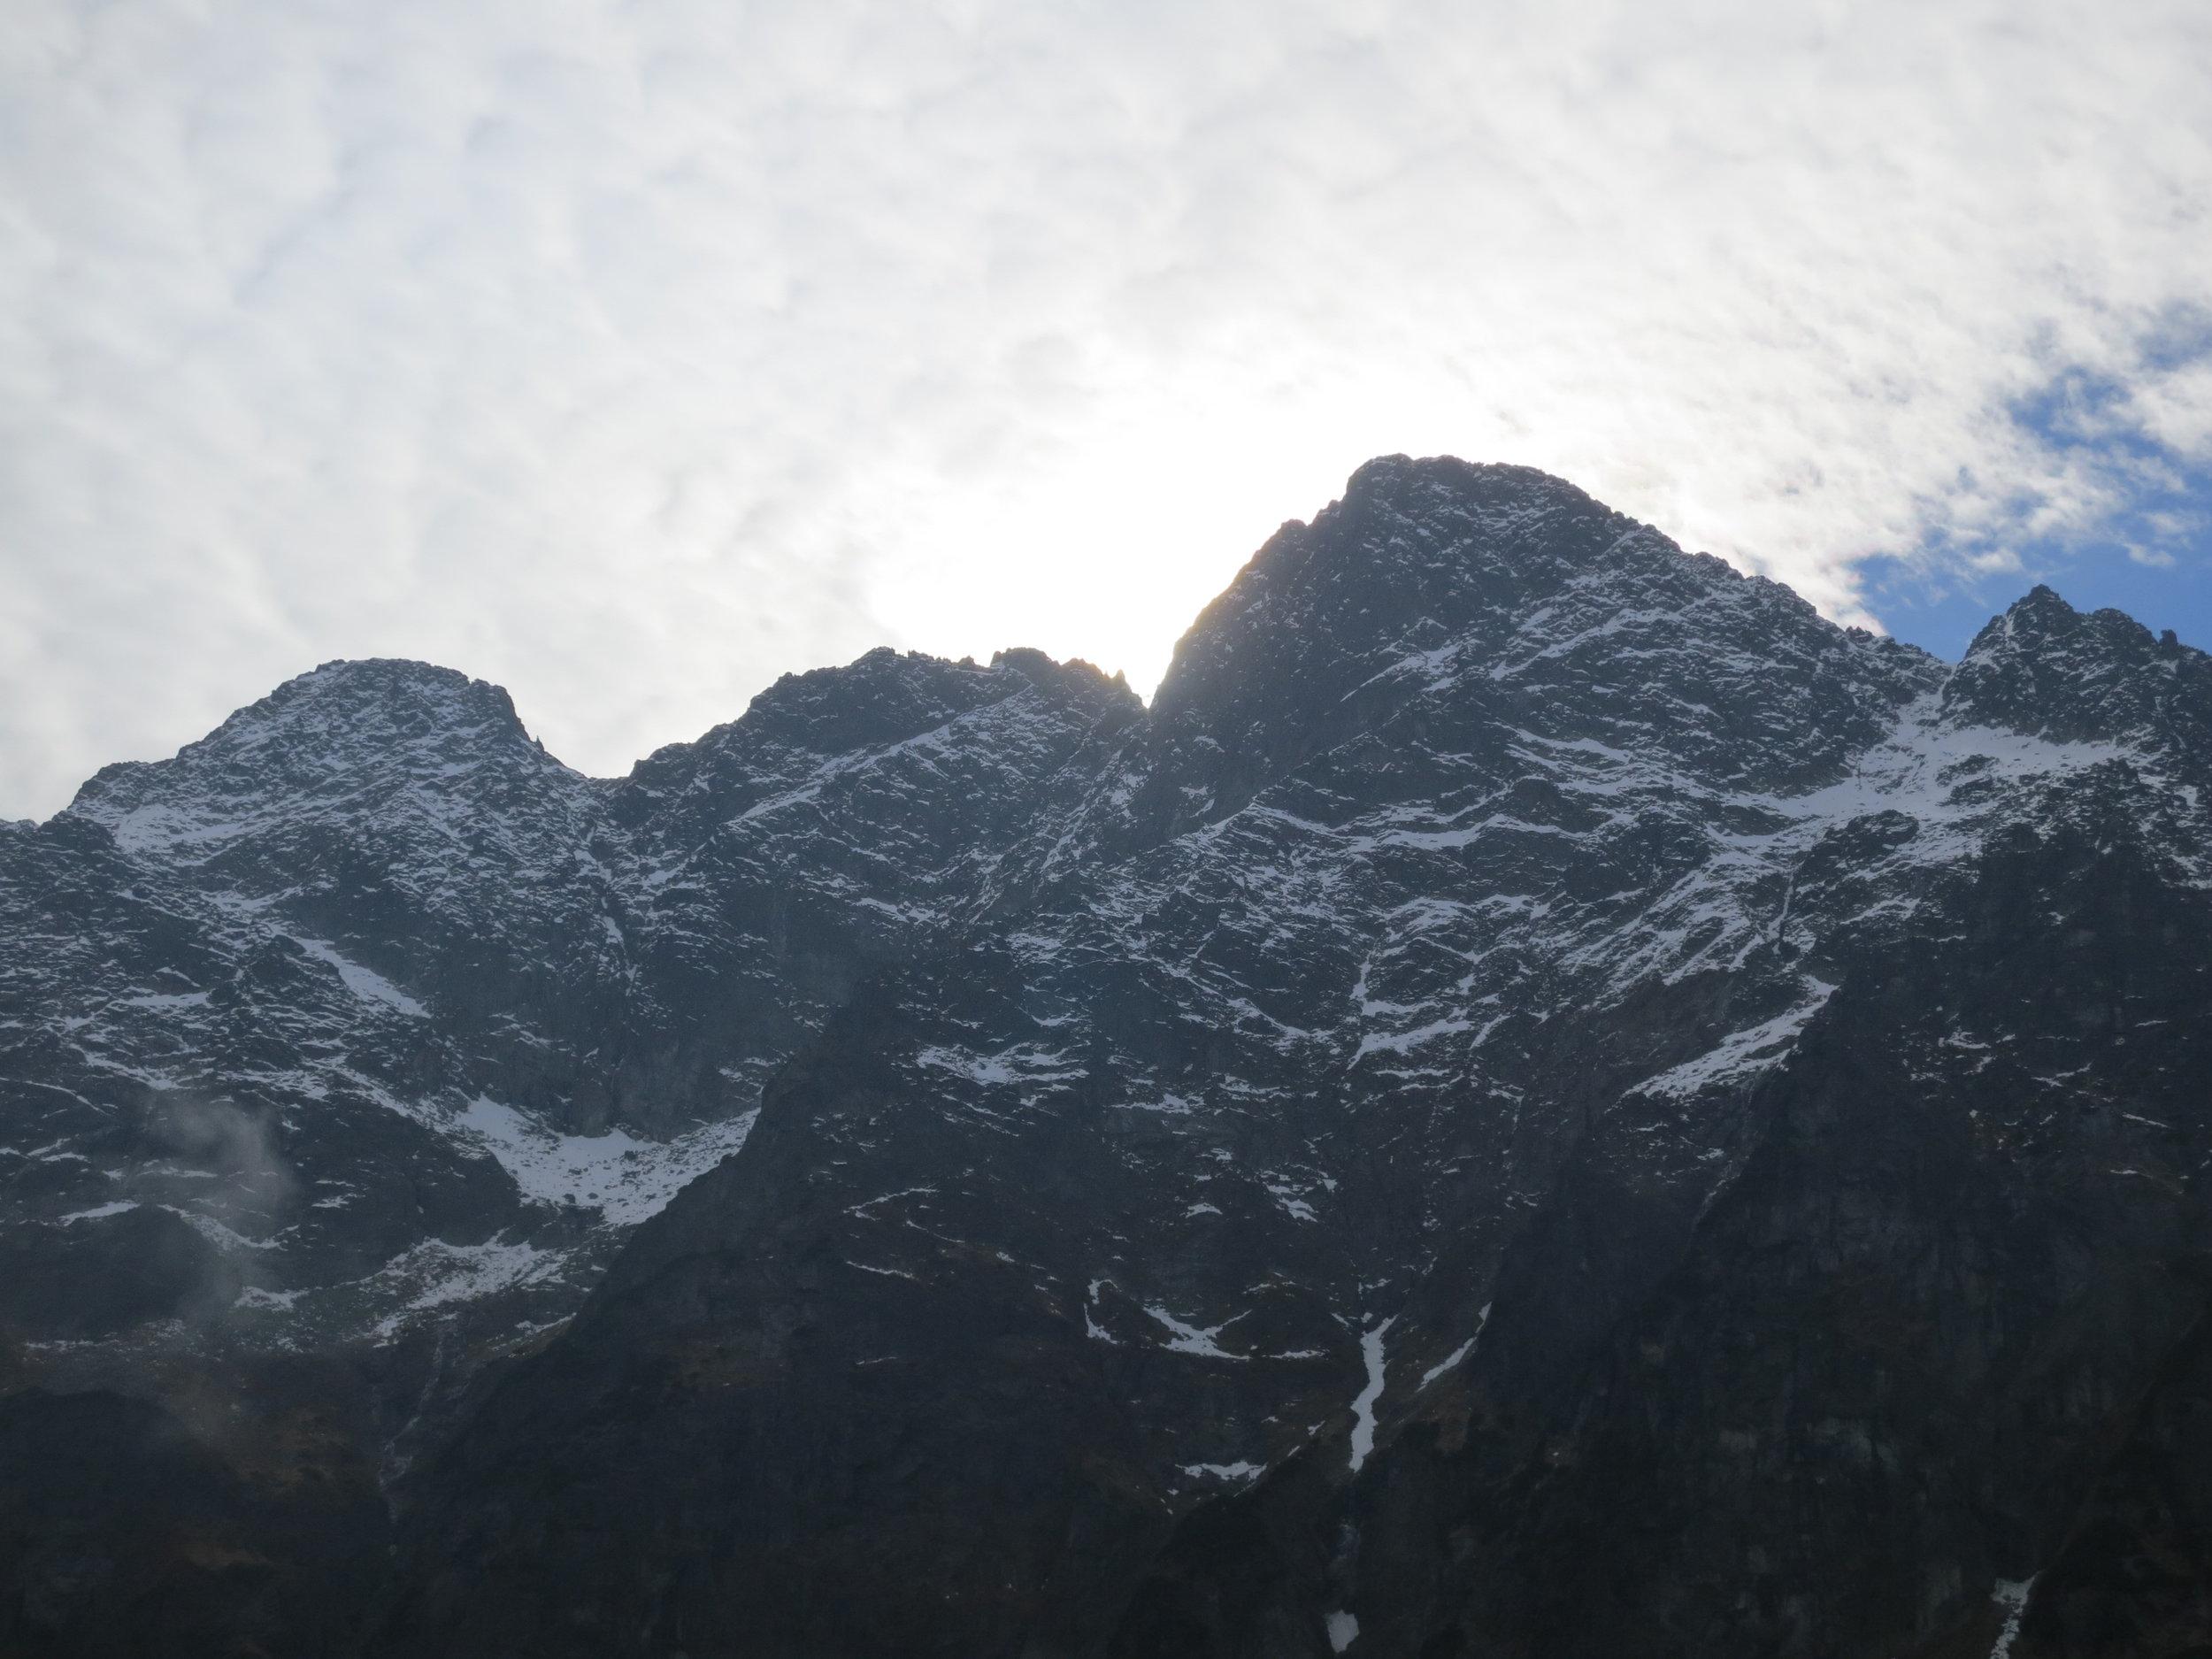 Mountain Peaks in the Tatra Mountains.